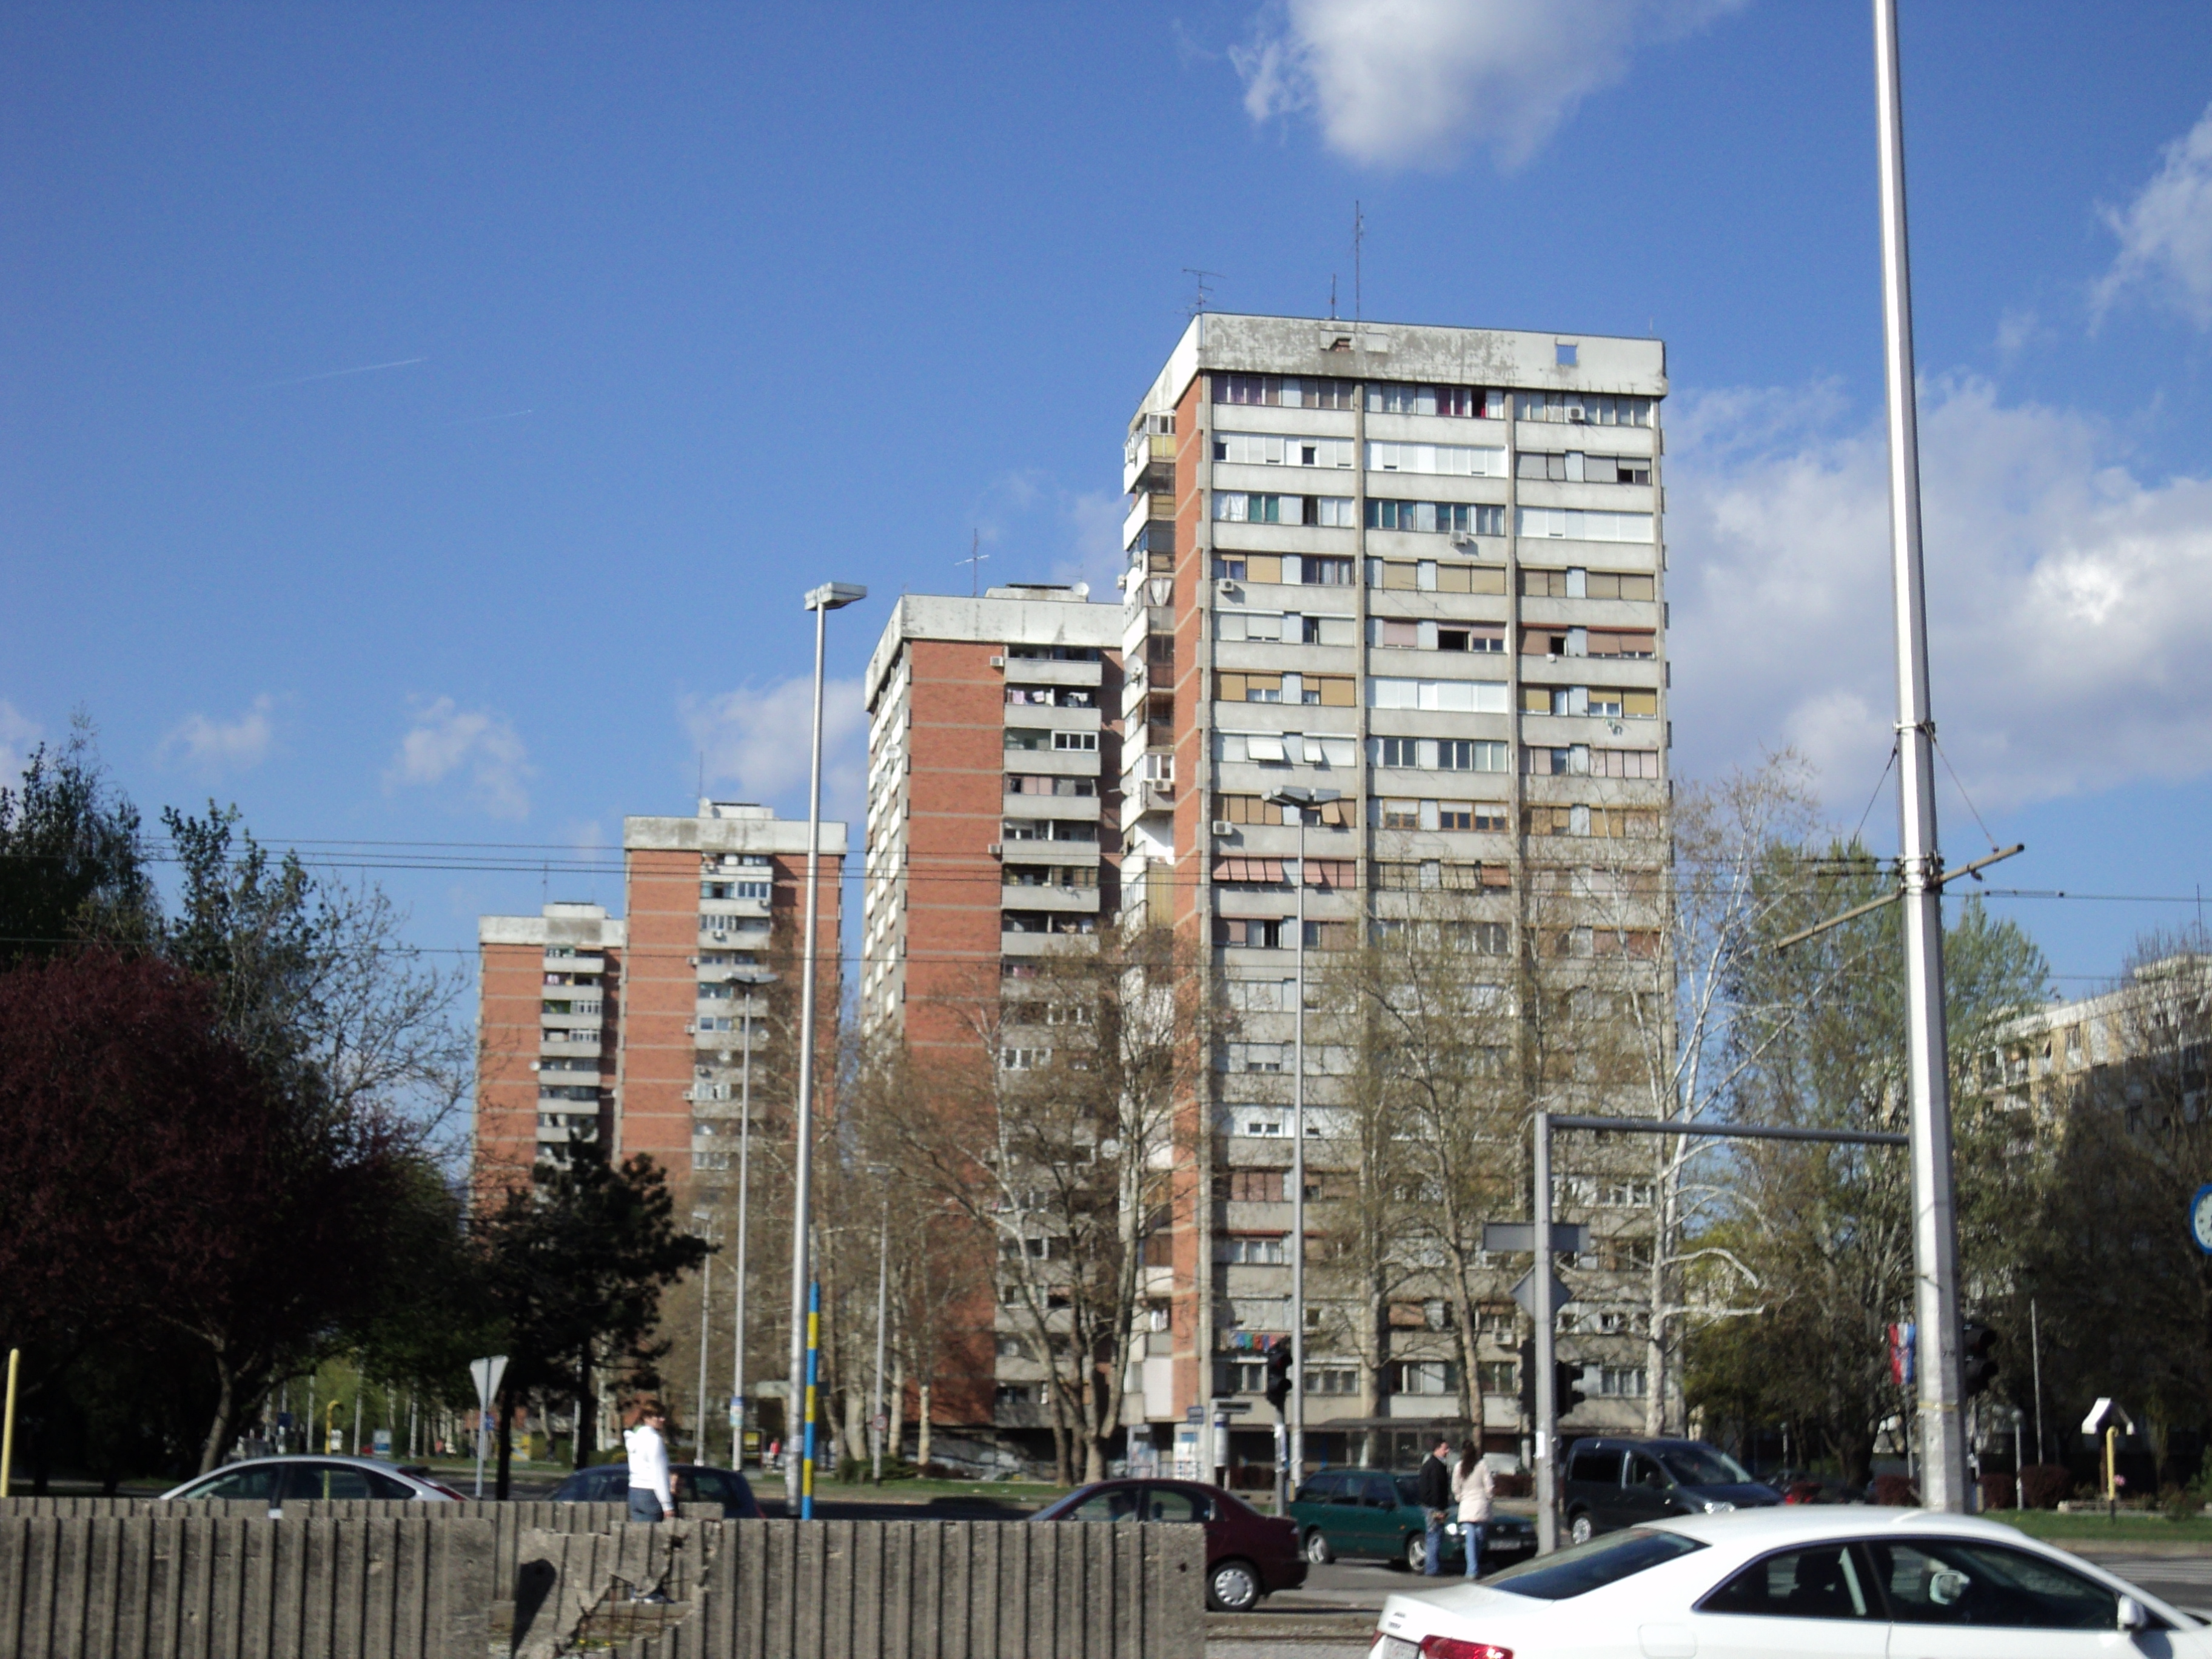 Datoteka:Zgrade na Knežiji-Zagreb.JPG - Wikipedija